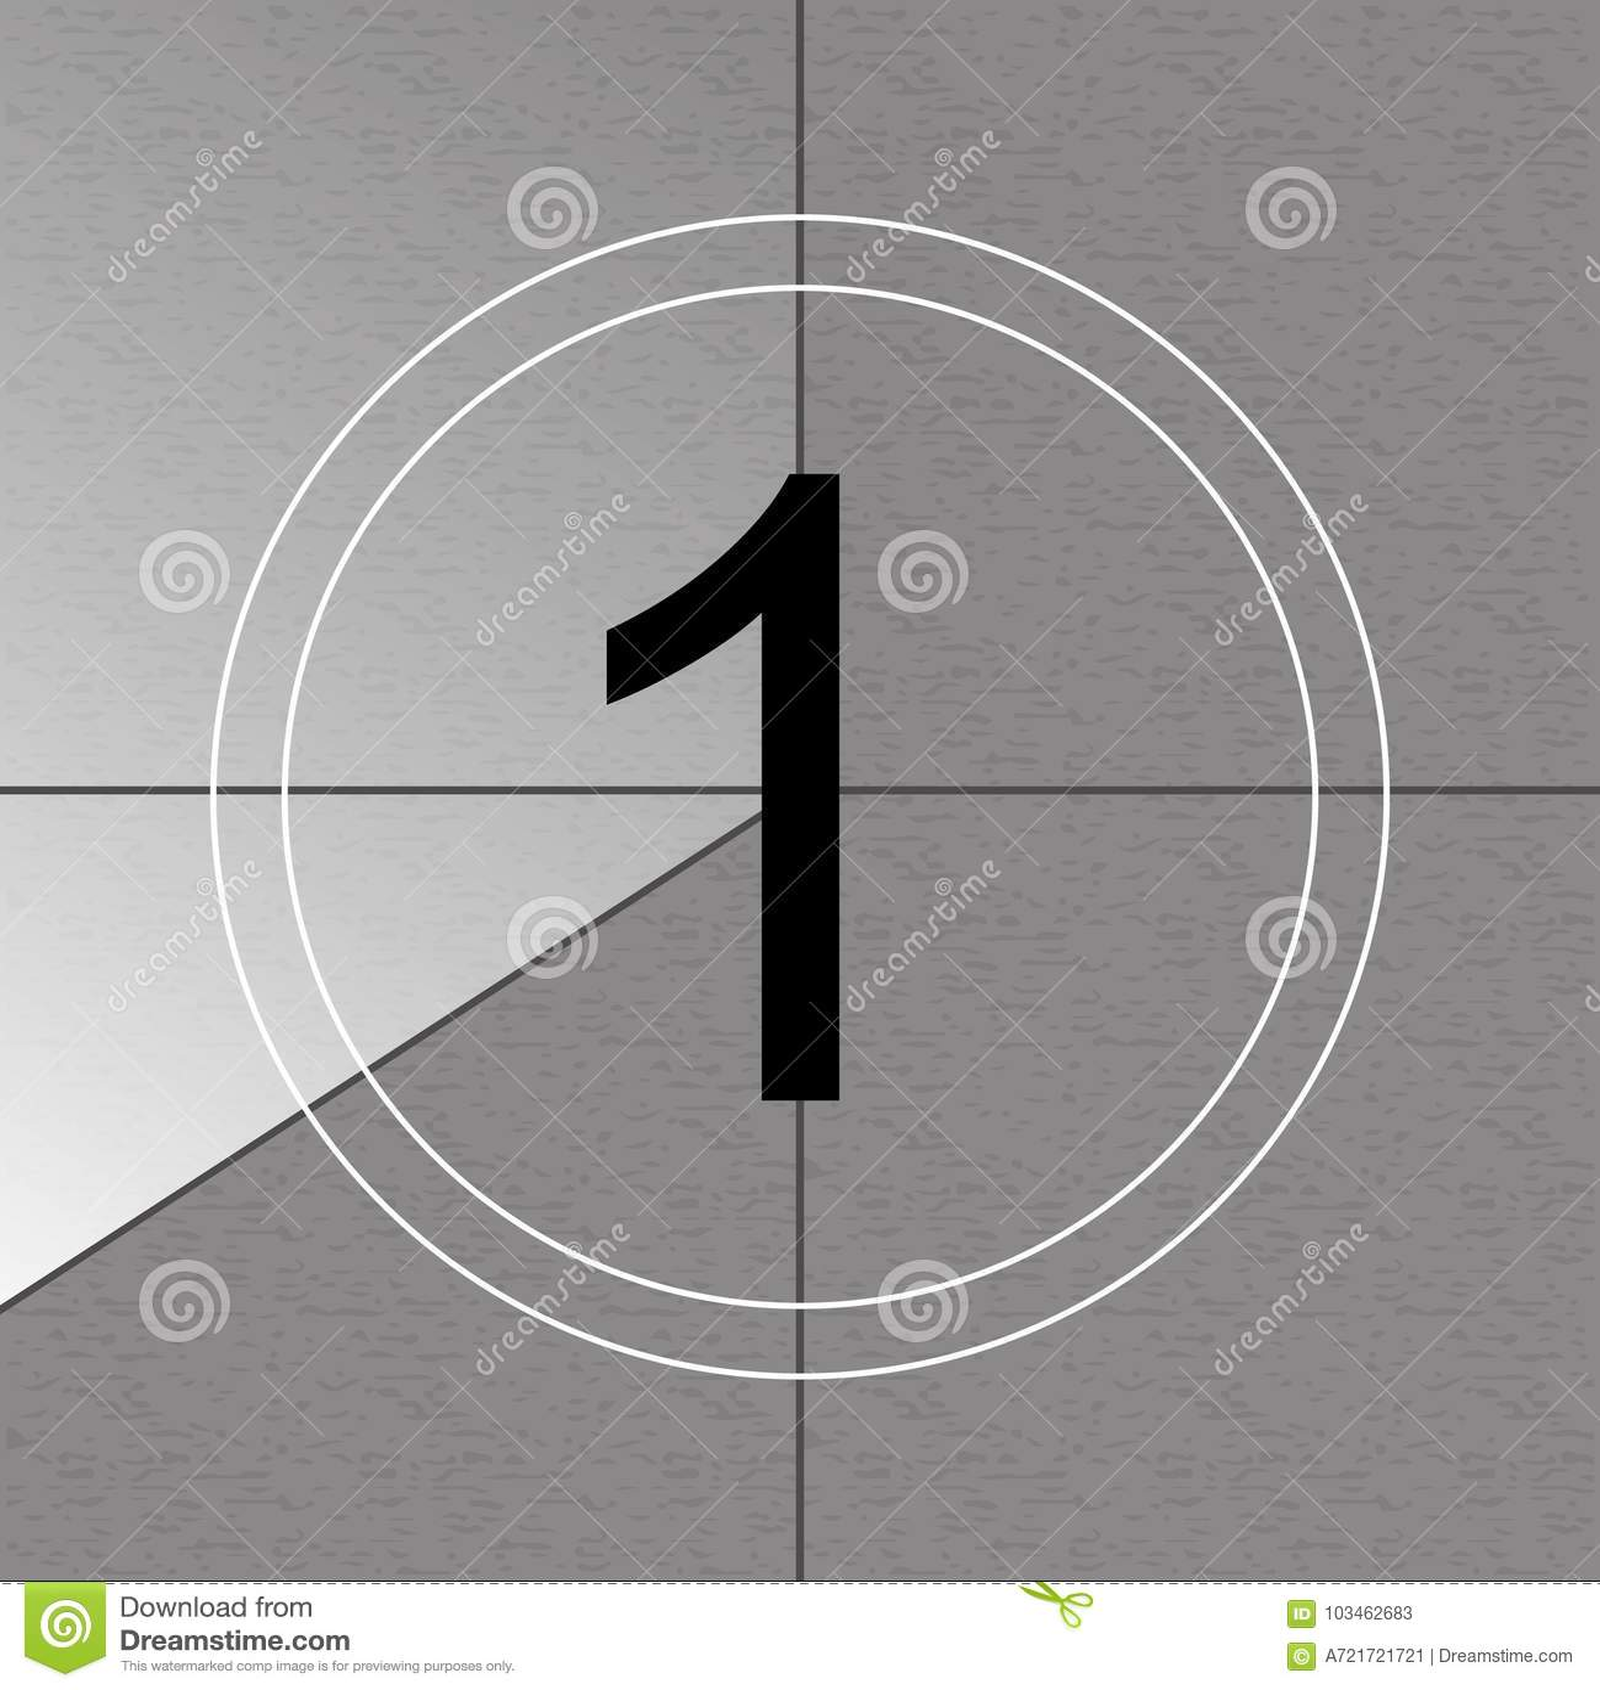 Creative vector illustration of countdown frame. Art design. Old film movie timer count. Vintage retro cinema. Abstract concept gr